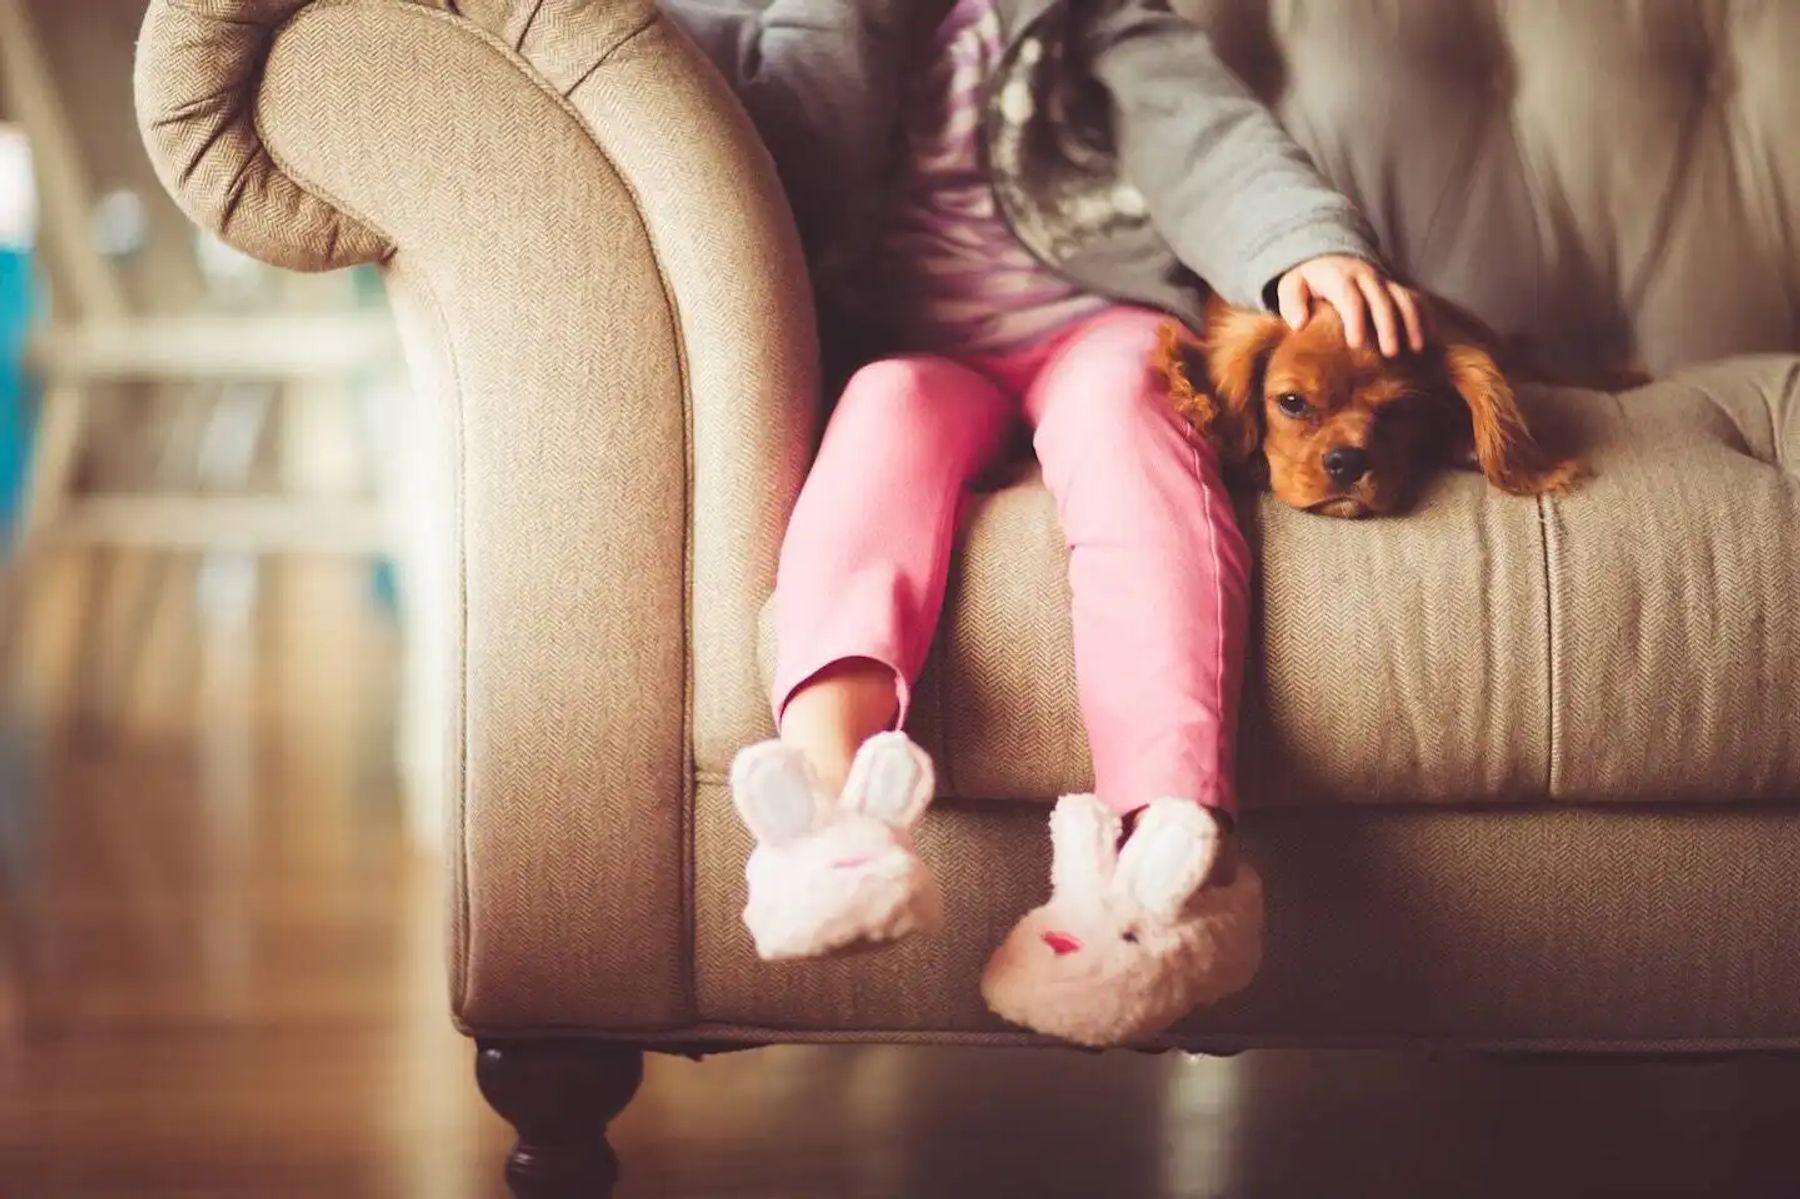 bảo quản ghế sofa